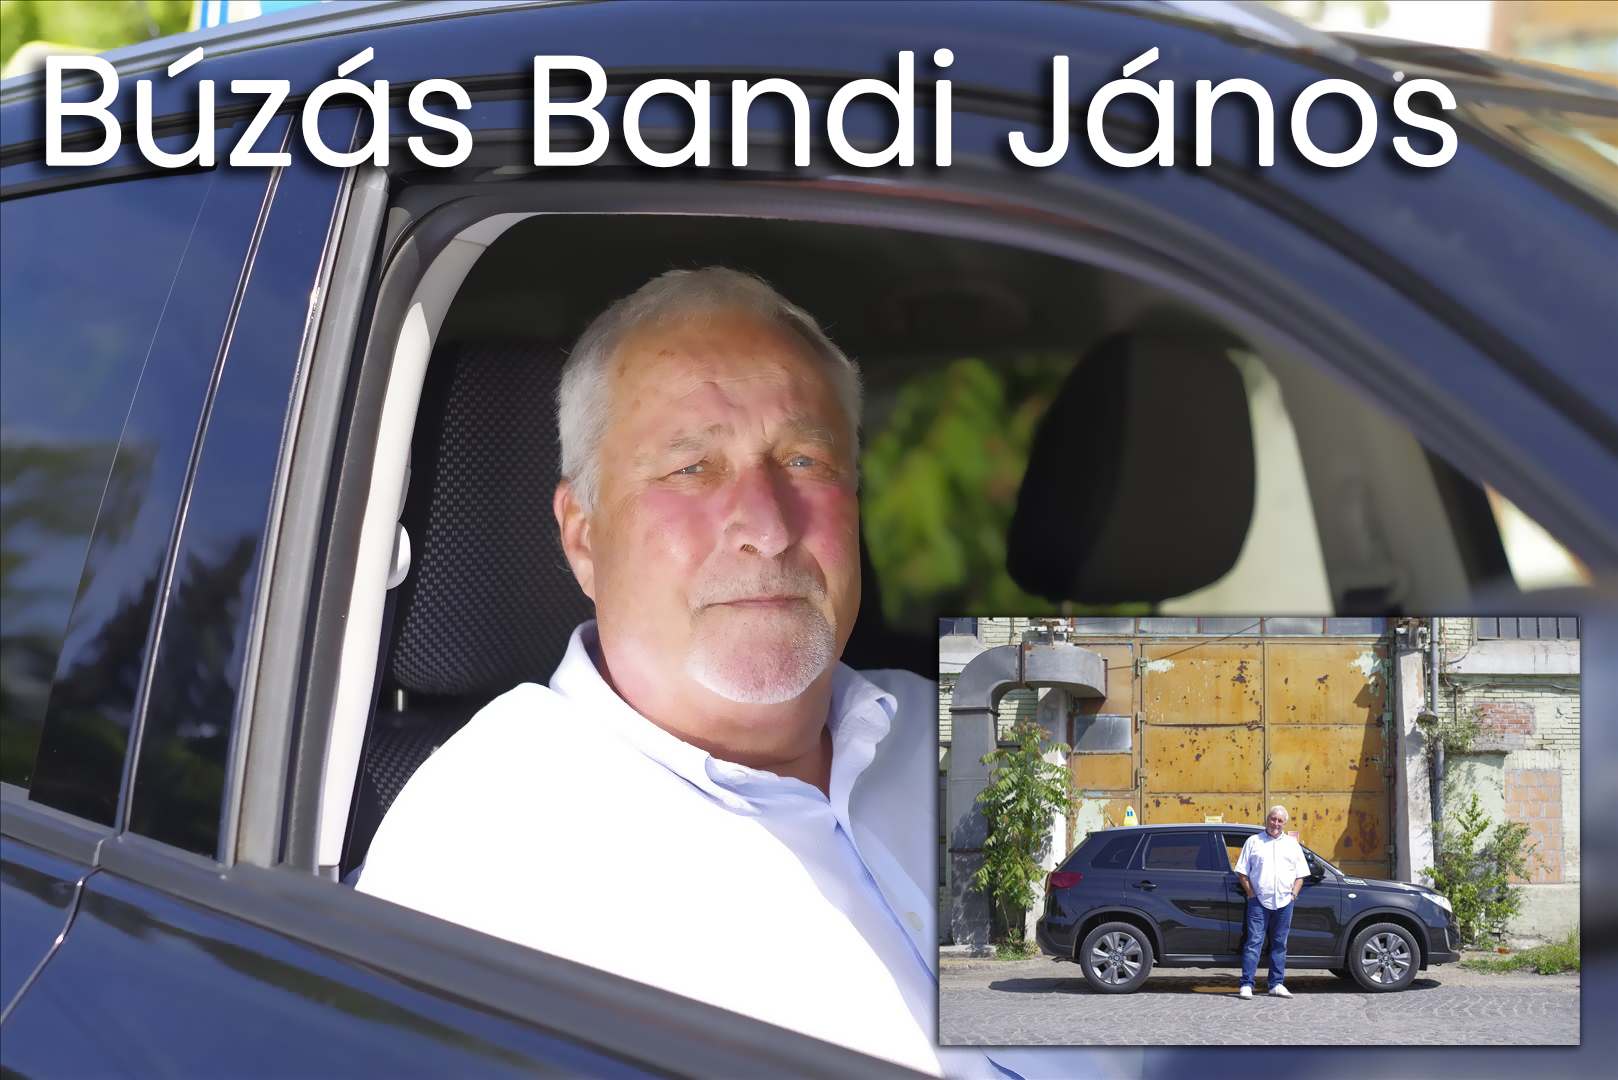 buzas_bandi_autosiskola